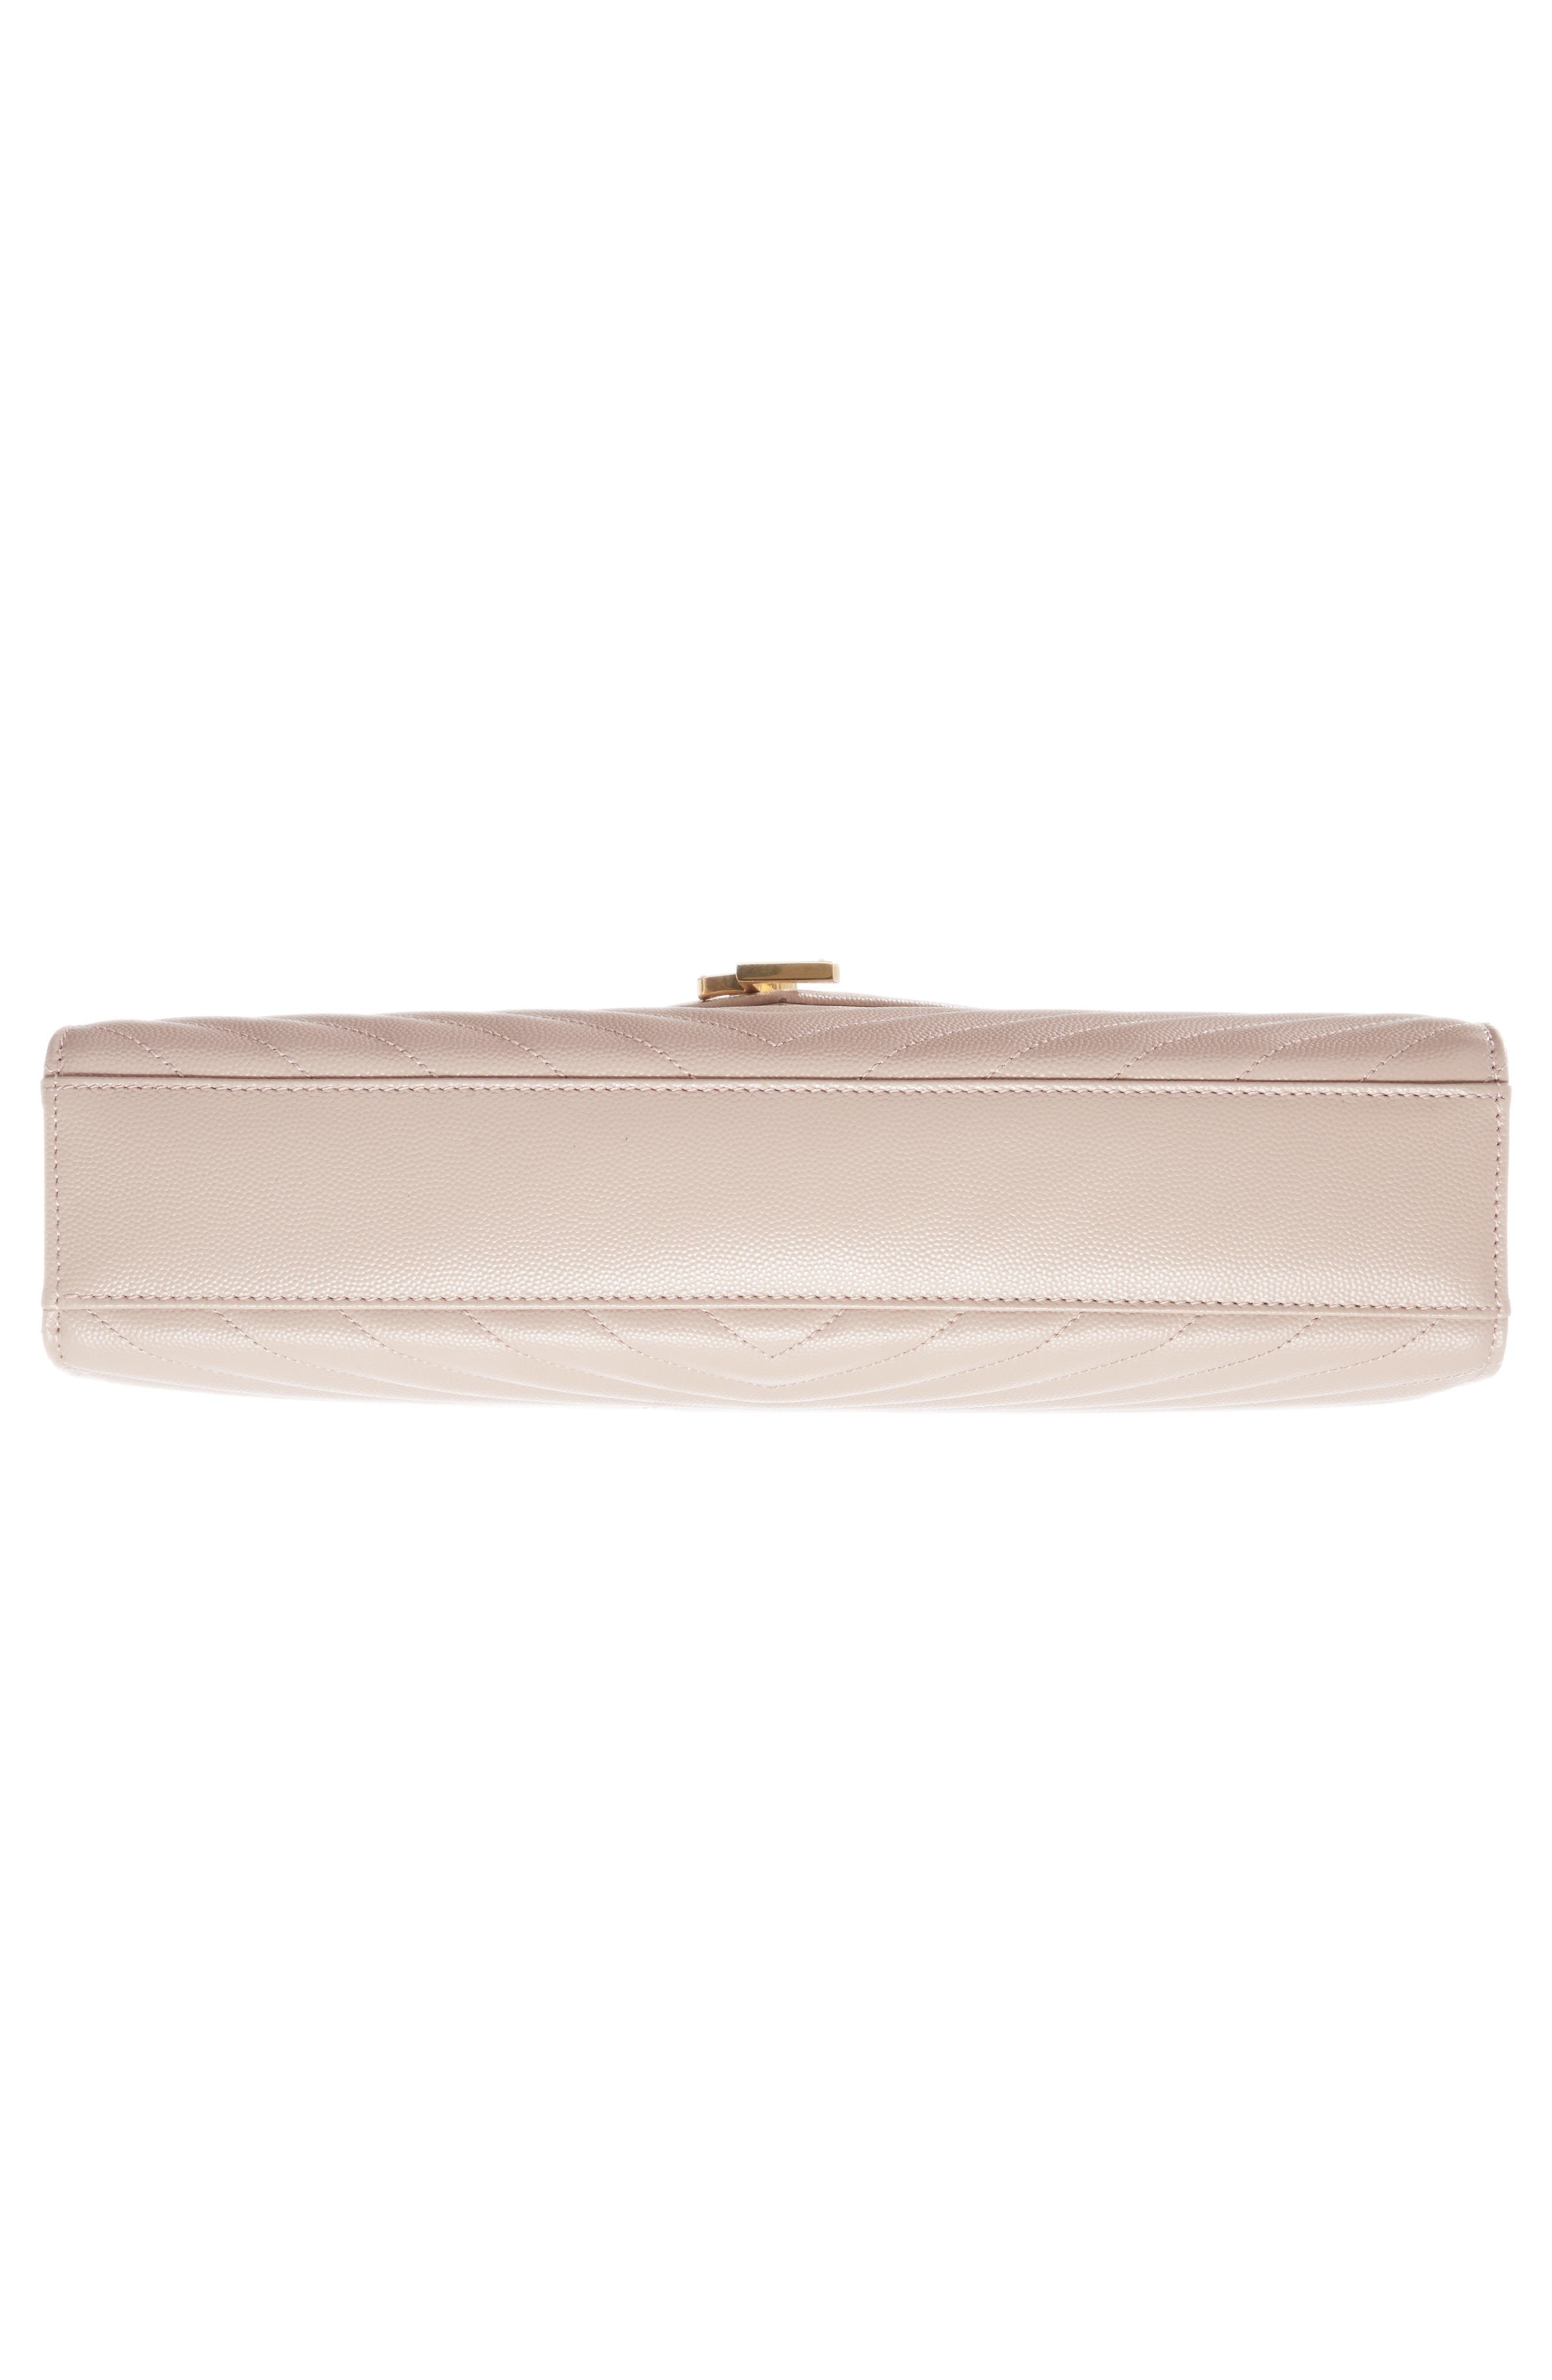 ,                             'Large Monogram' Grained Leather Shoulder Bag,                             Alternate thumbnail 46, color,                             657